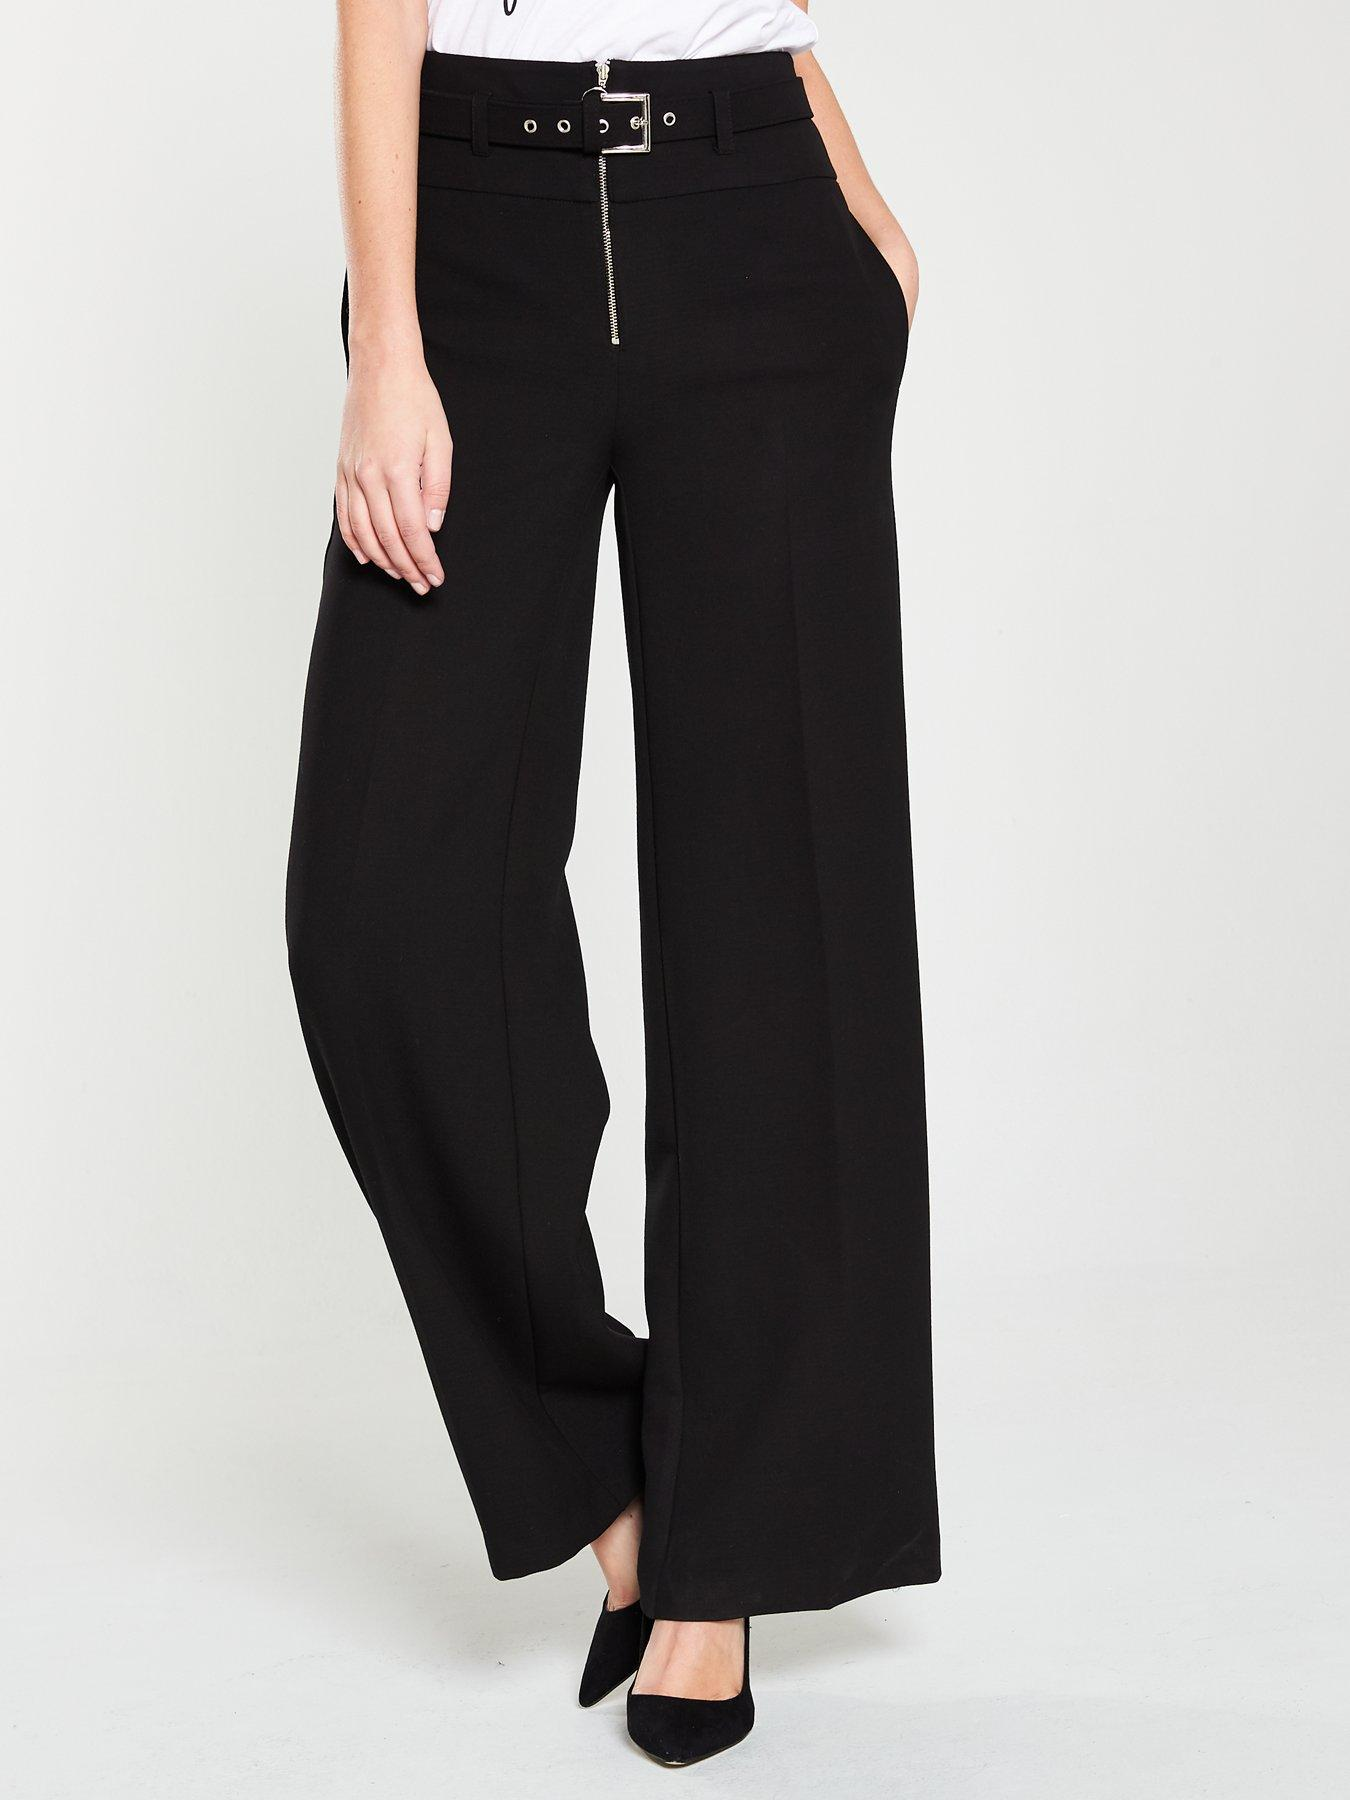 TrousersHigh Women Waistamp; Www Casual Leggings OwPk8n0